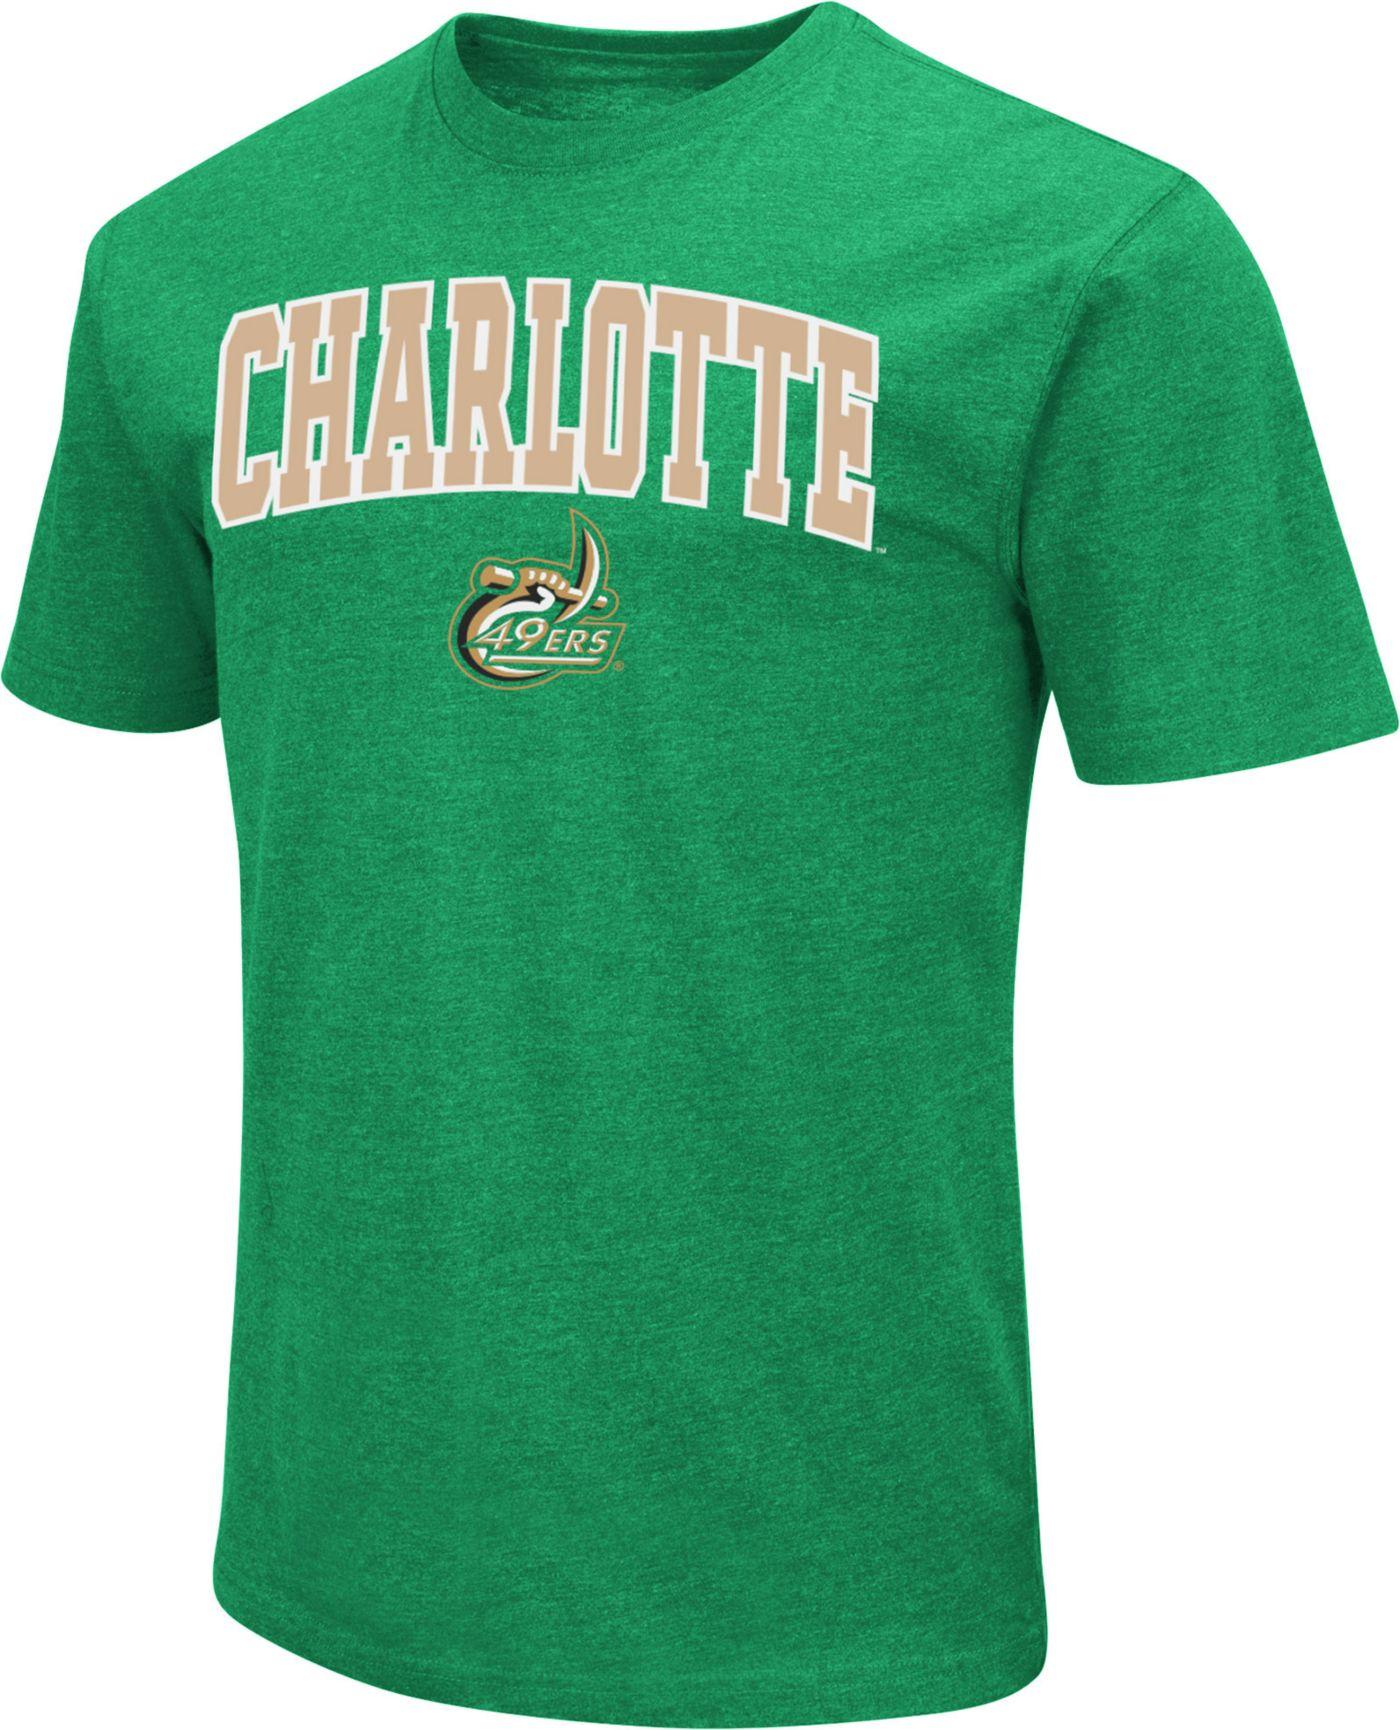 Colosseum Men's Charlotte 49ers Dual Blend Green T-Shirt